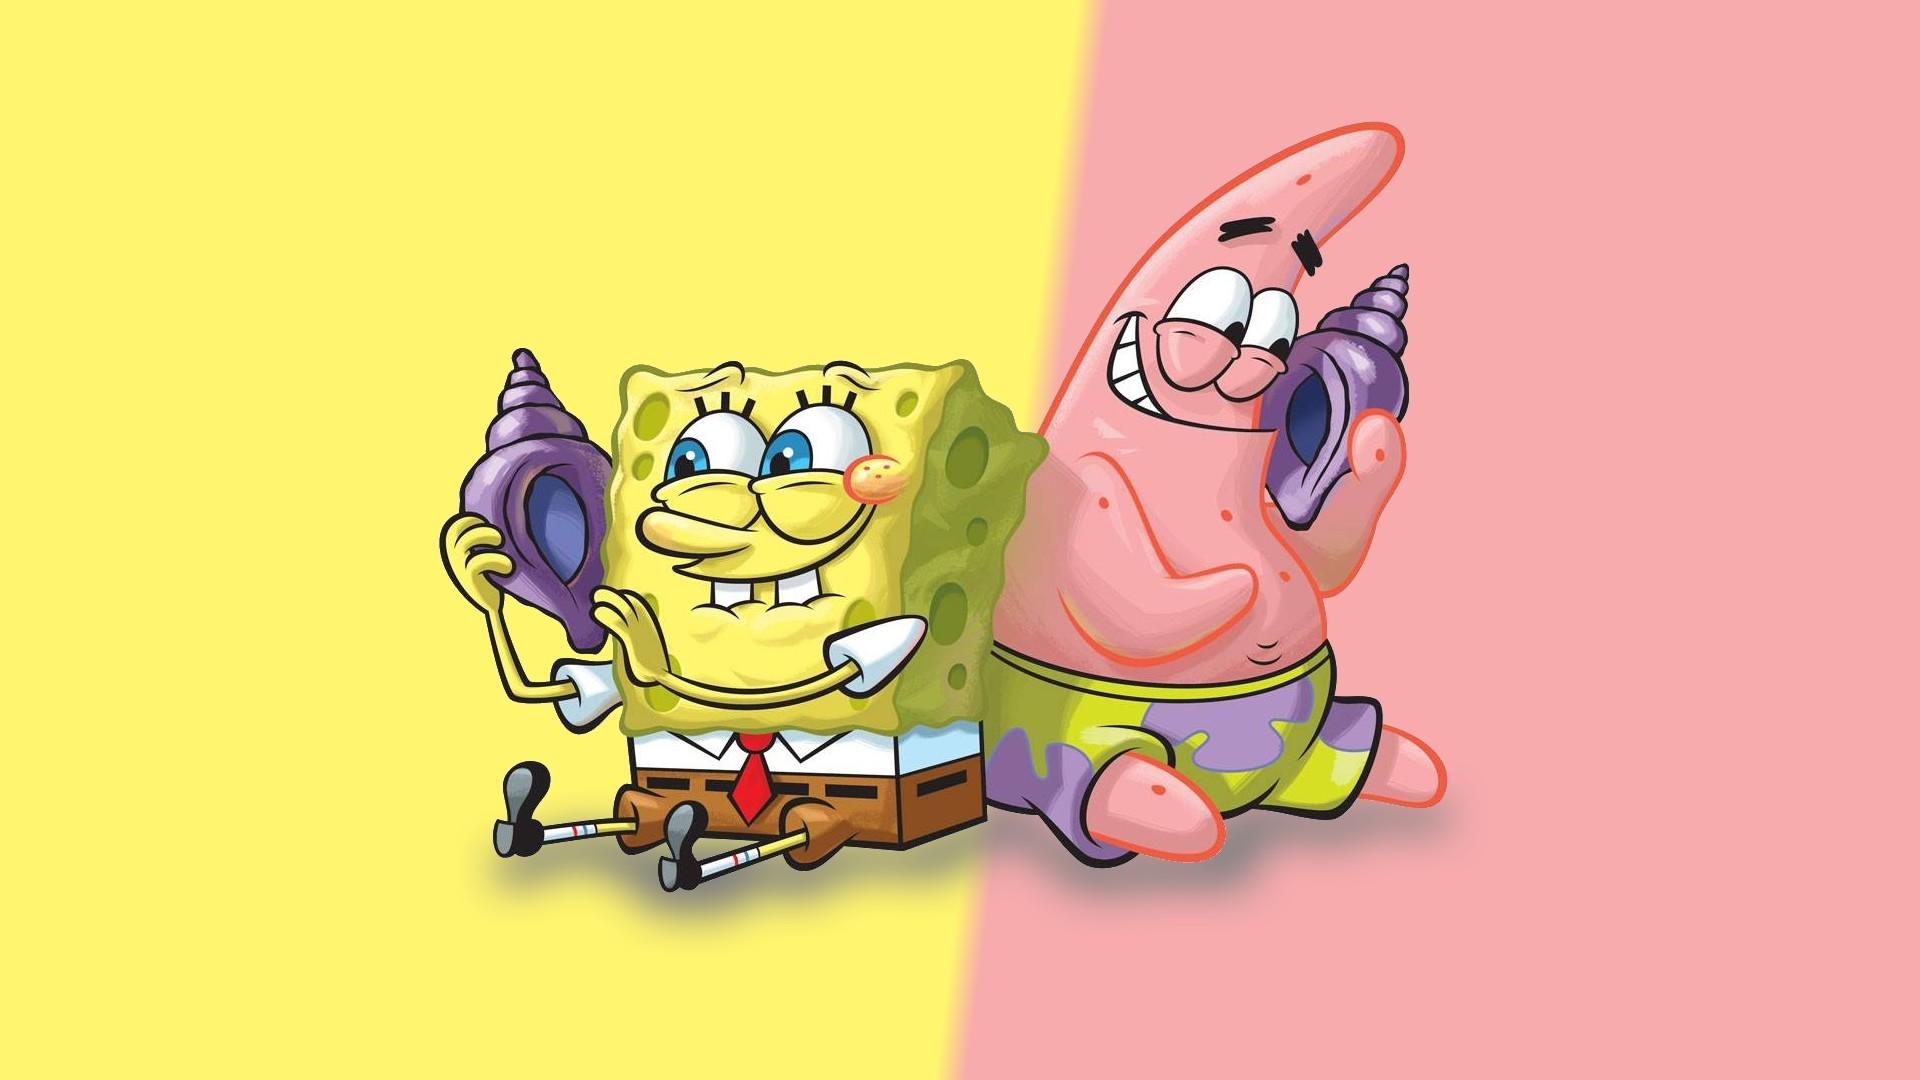 Spongebob and Patrick Desktop Wallpaper 58838